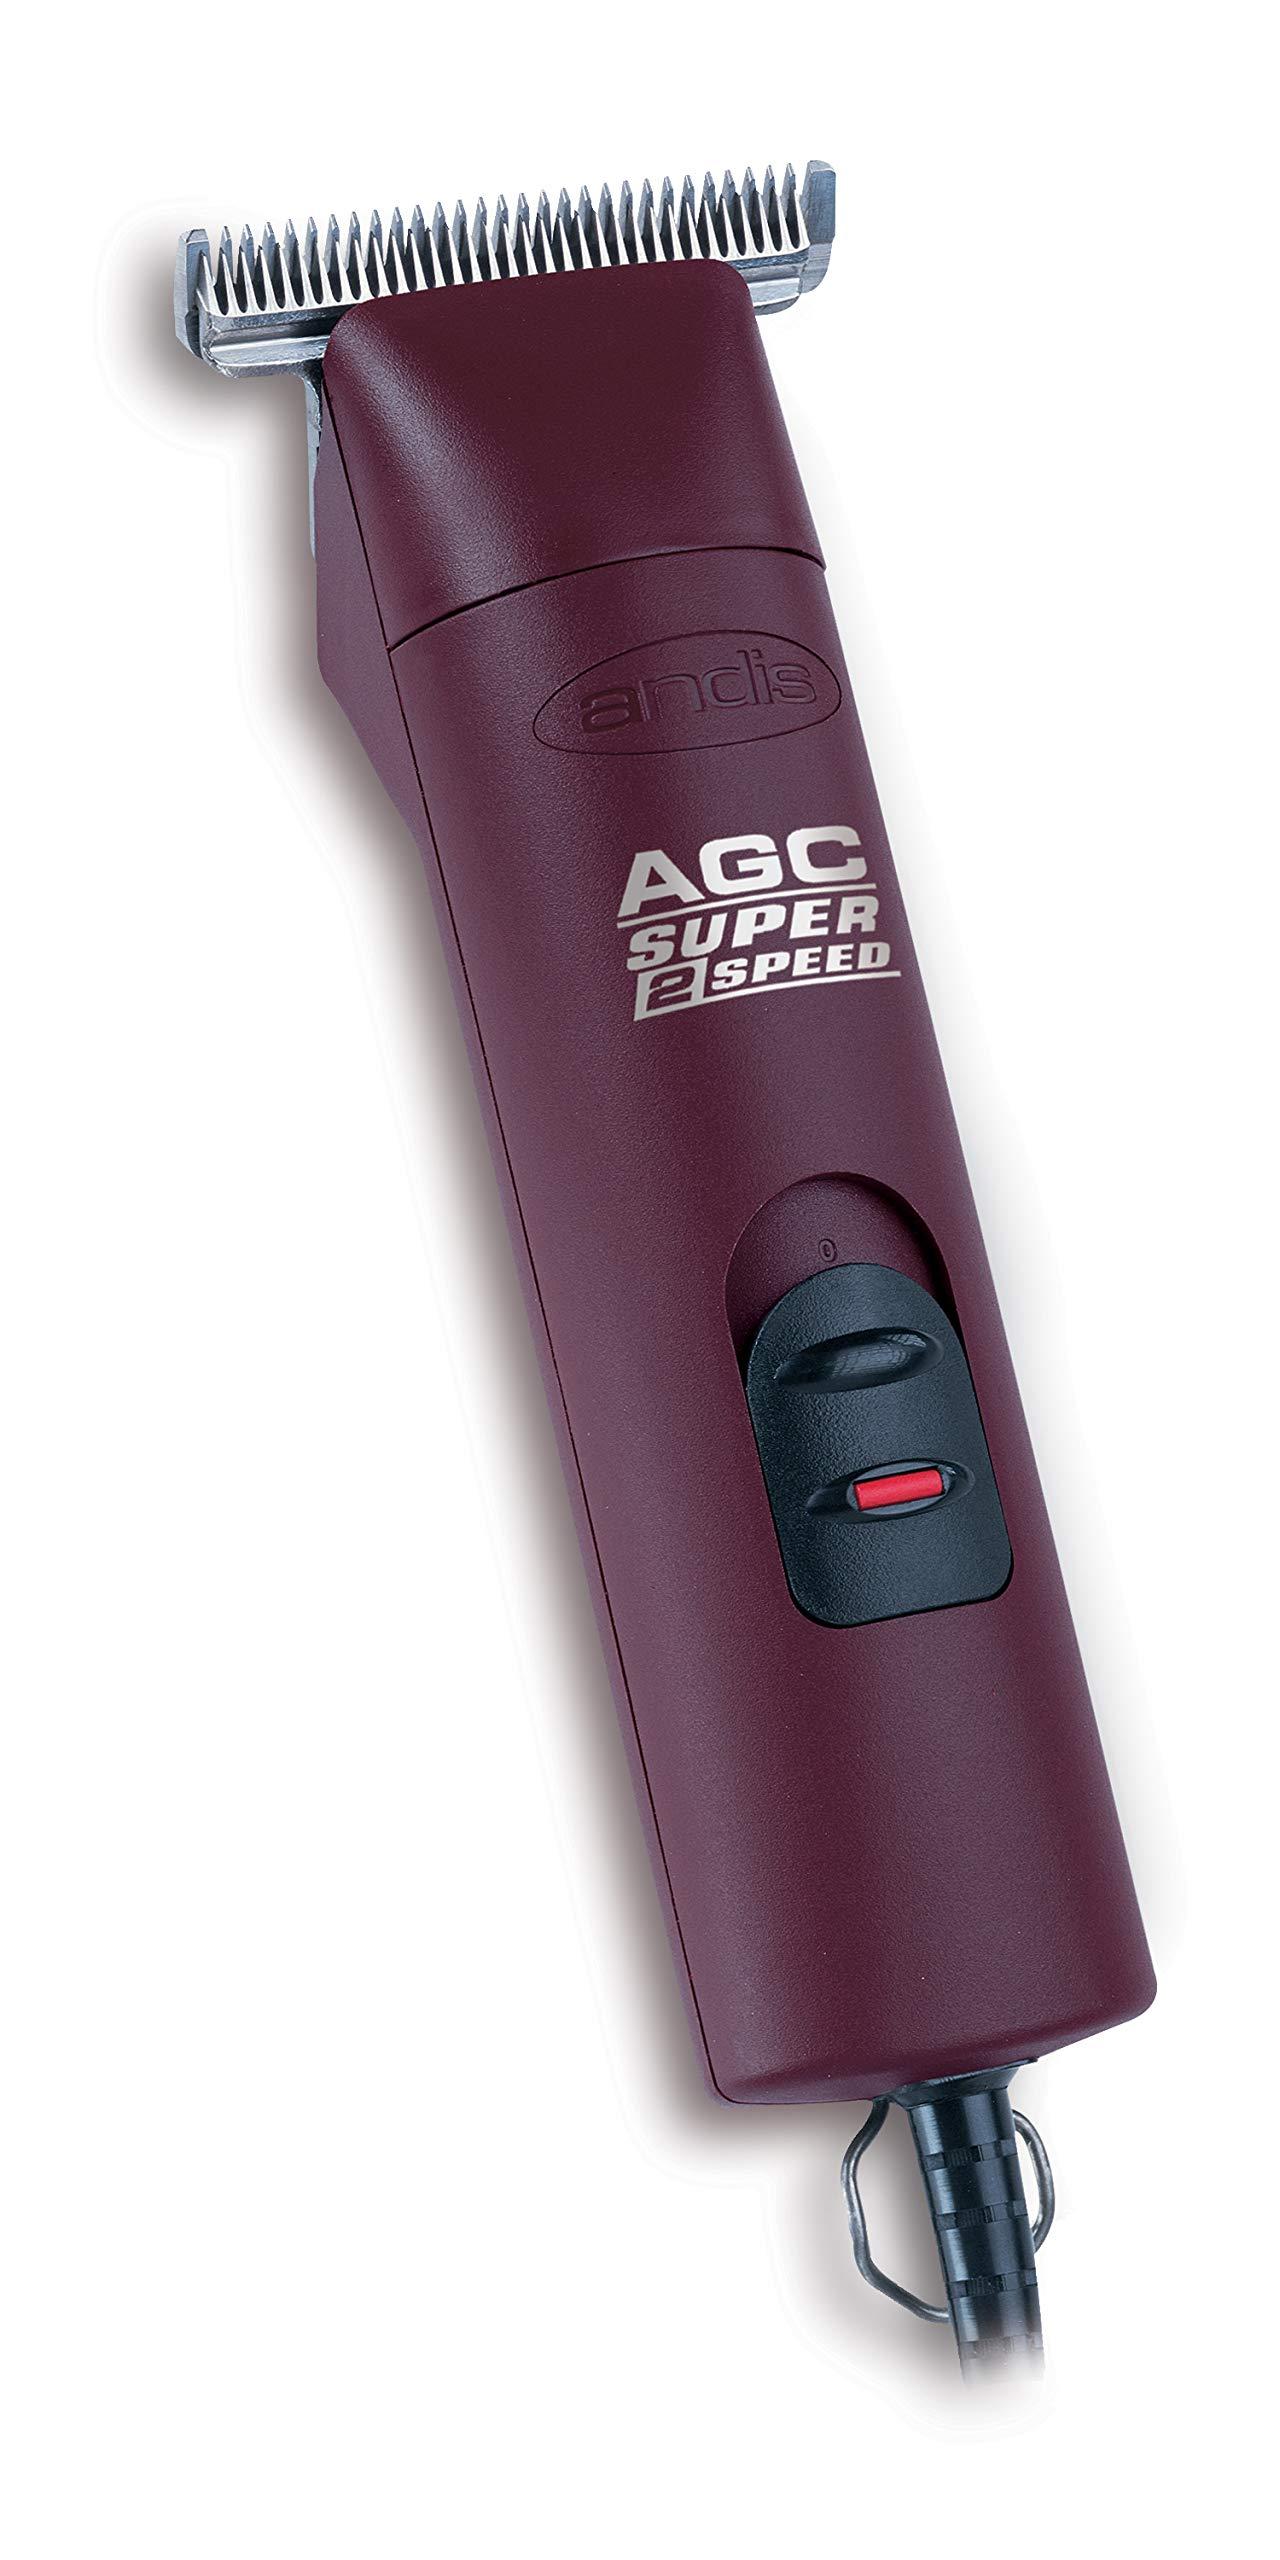 Andis 2-Speed Detachable Blade Equine & Livestock Professional Grooming, Burgundy 22330, AGC2